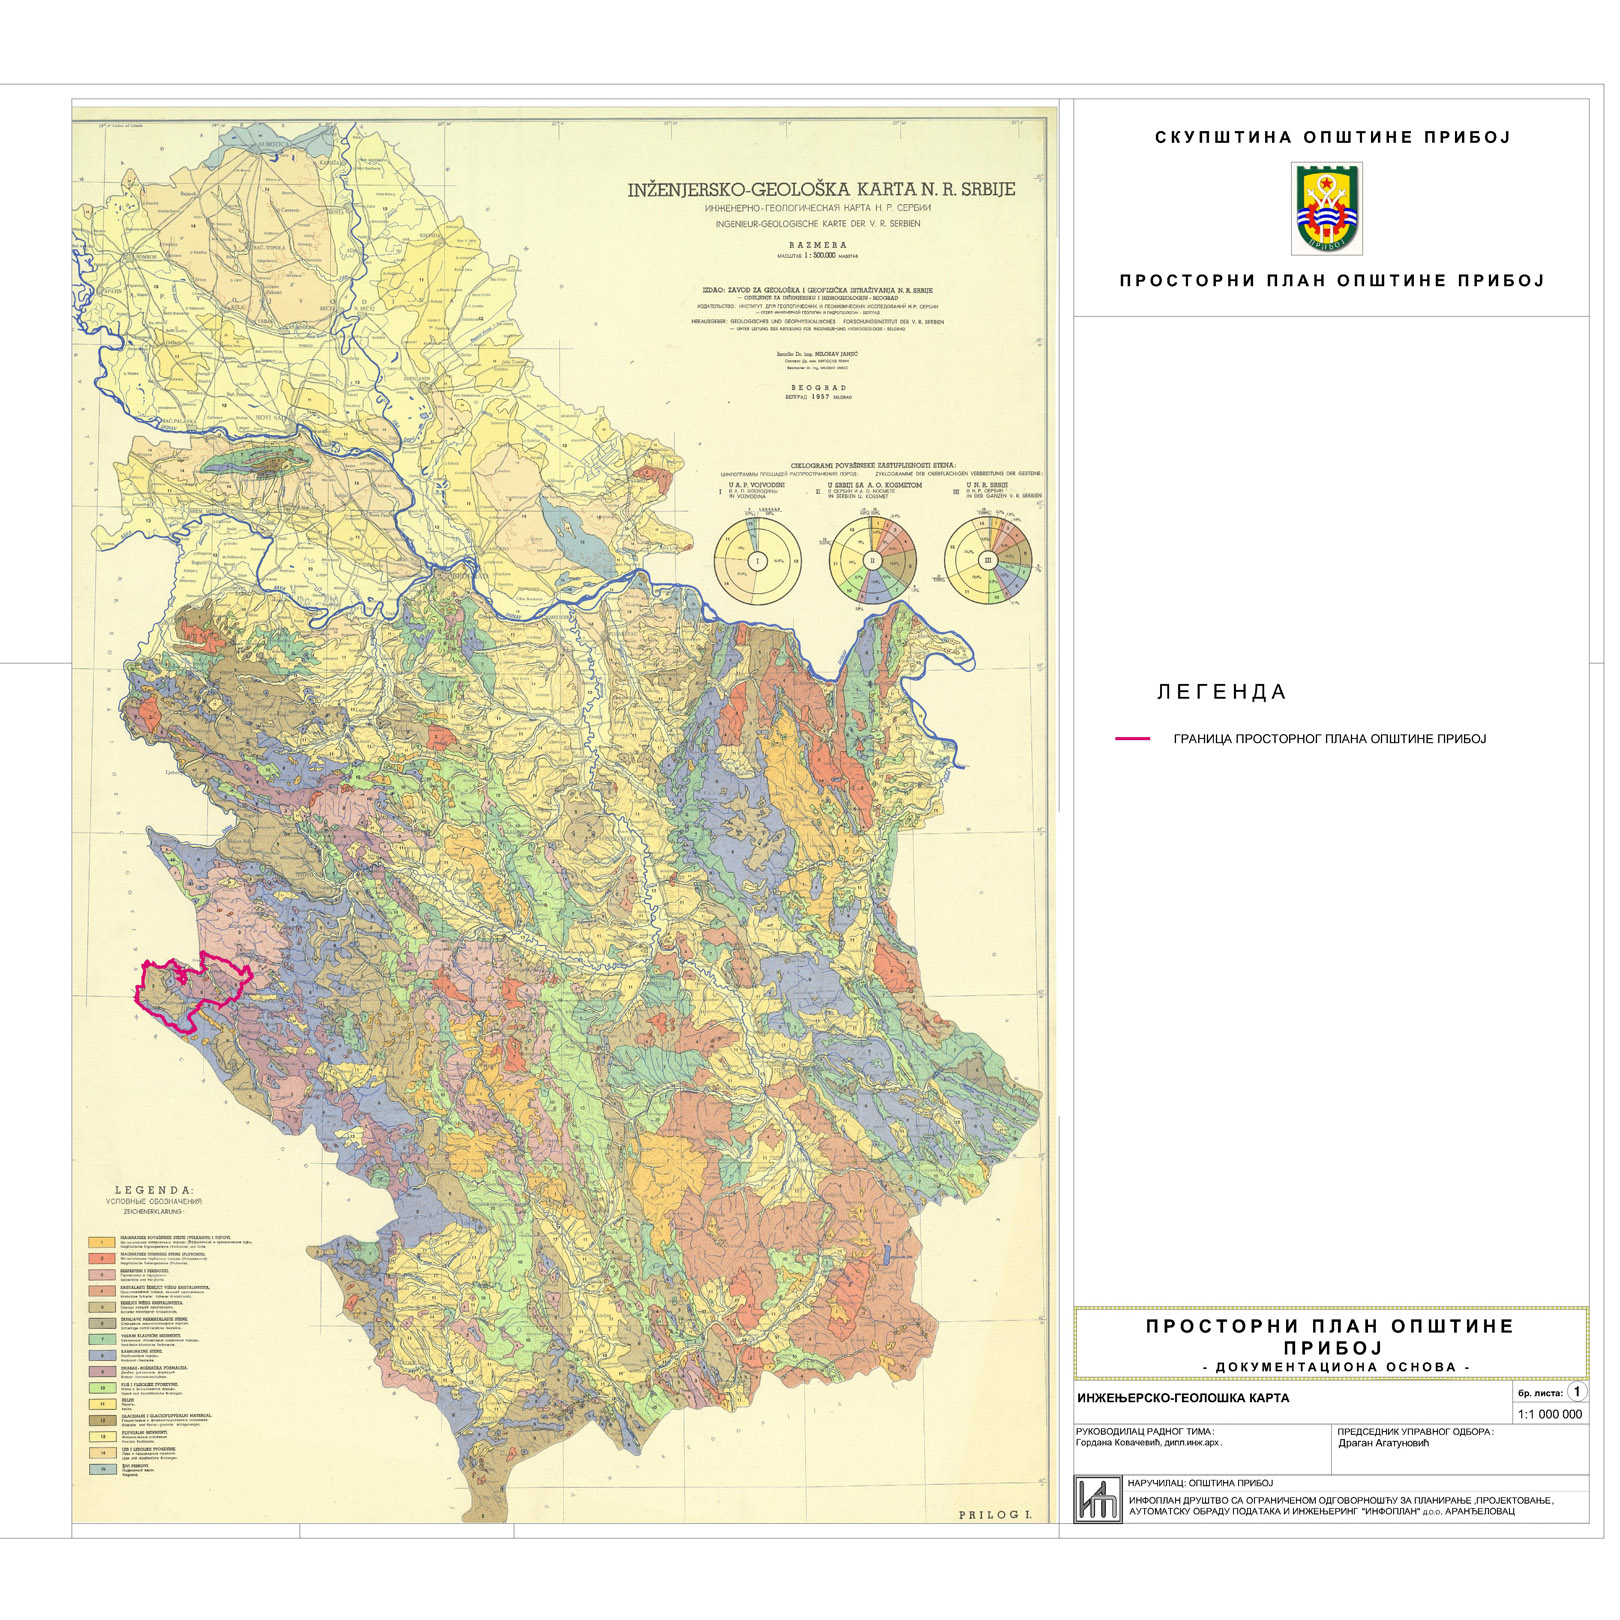 Seizmicka Karta Srbije Superjoden